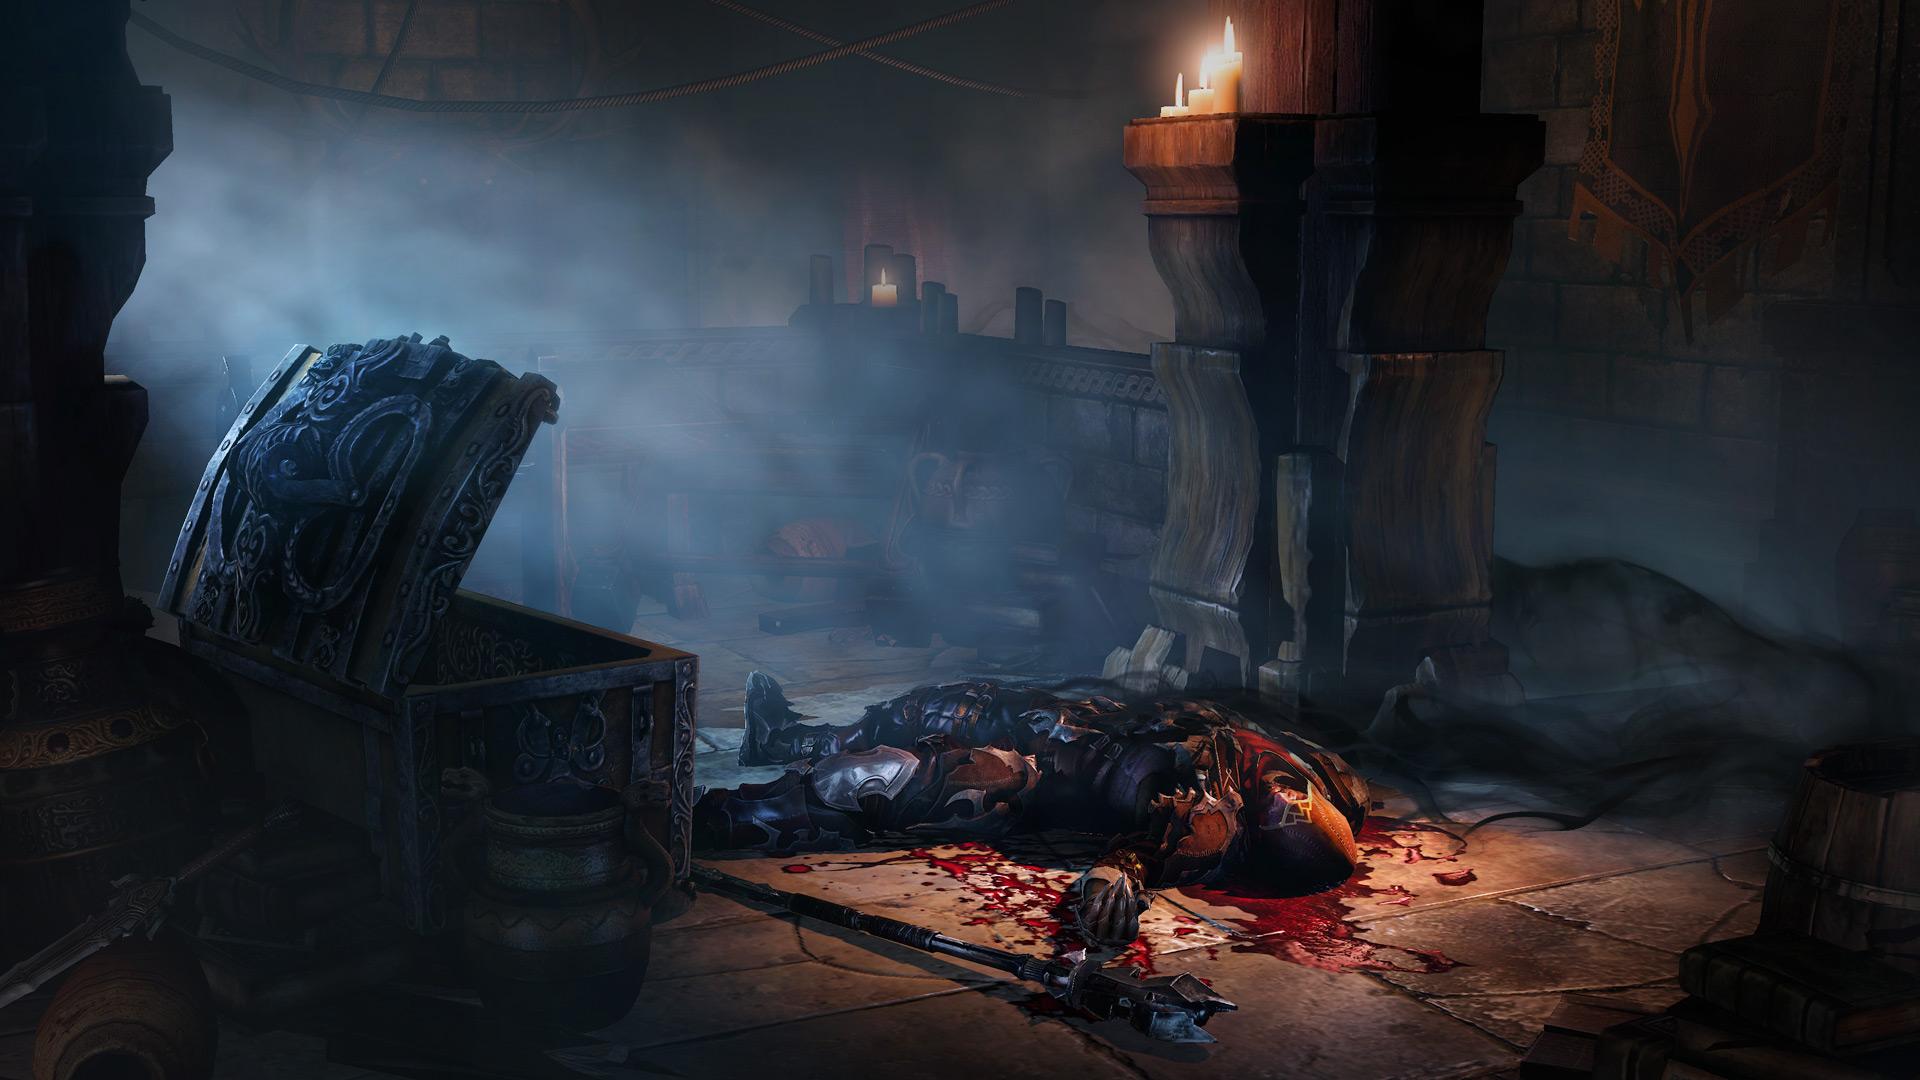 KHAiHOM.com - Lords Of The Fallen™